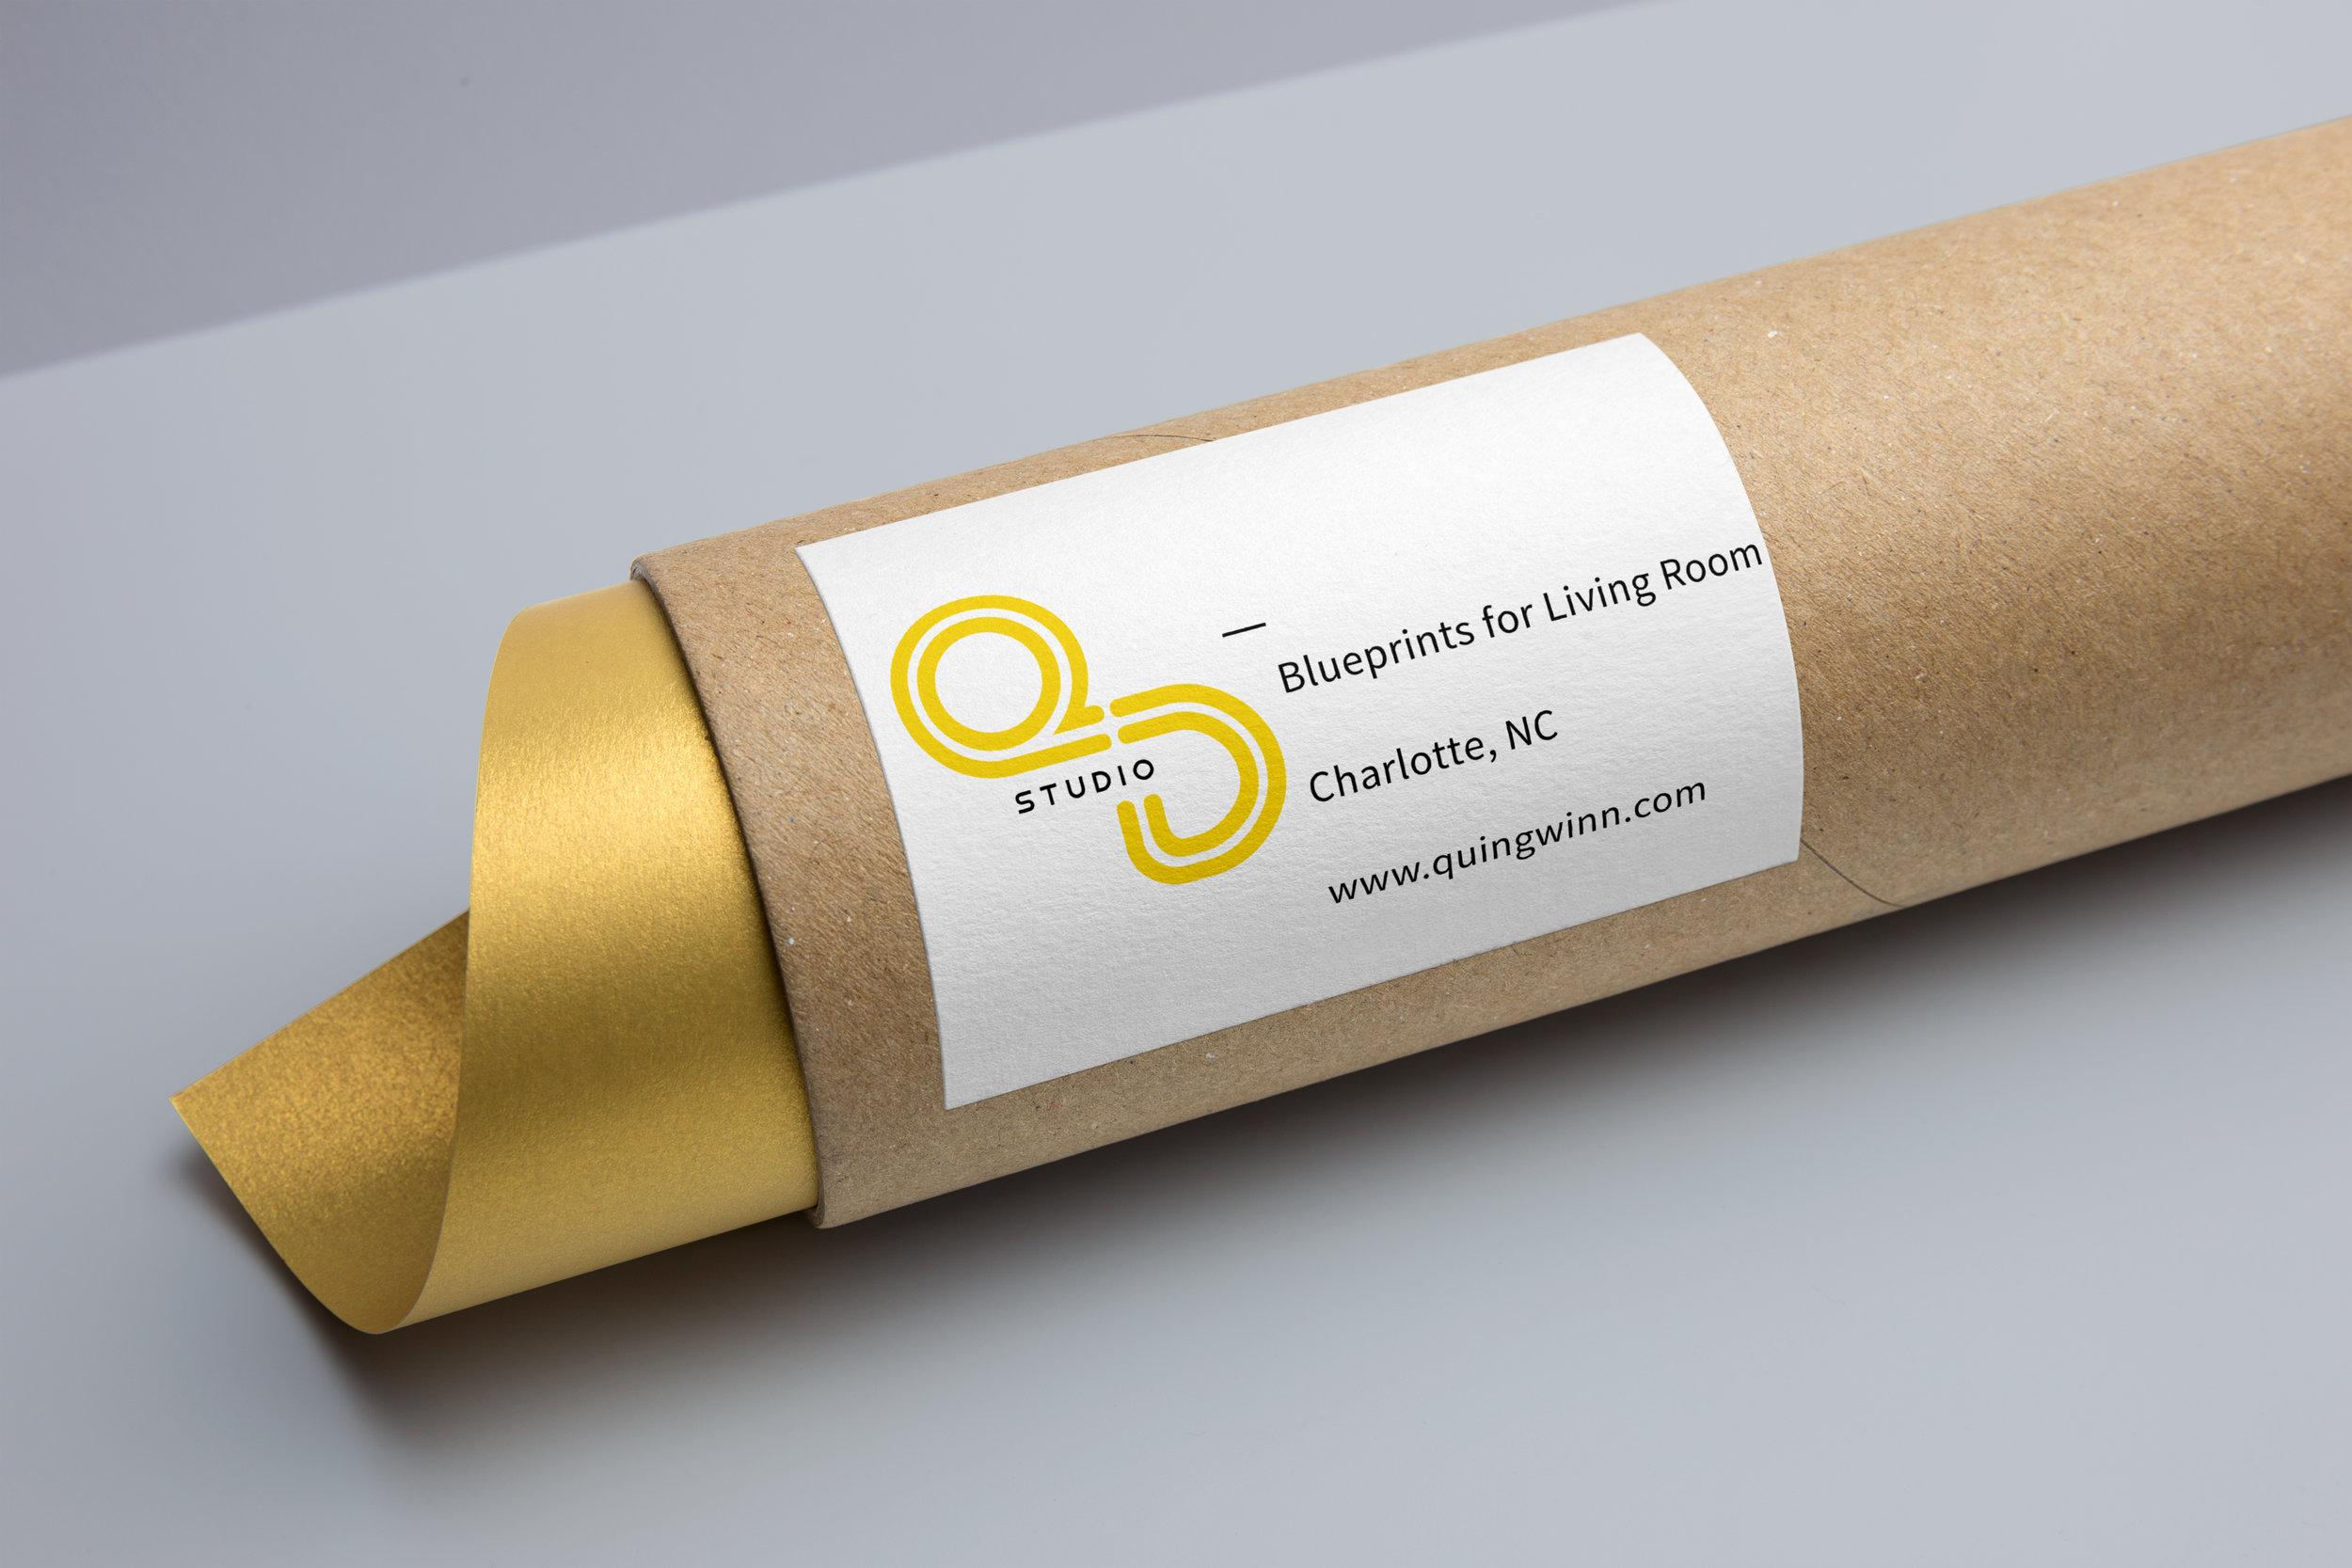 QG-BluePrint Tube Packaging.jpg